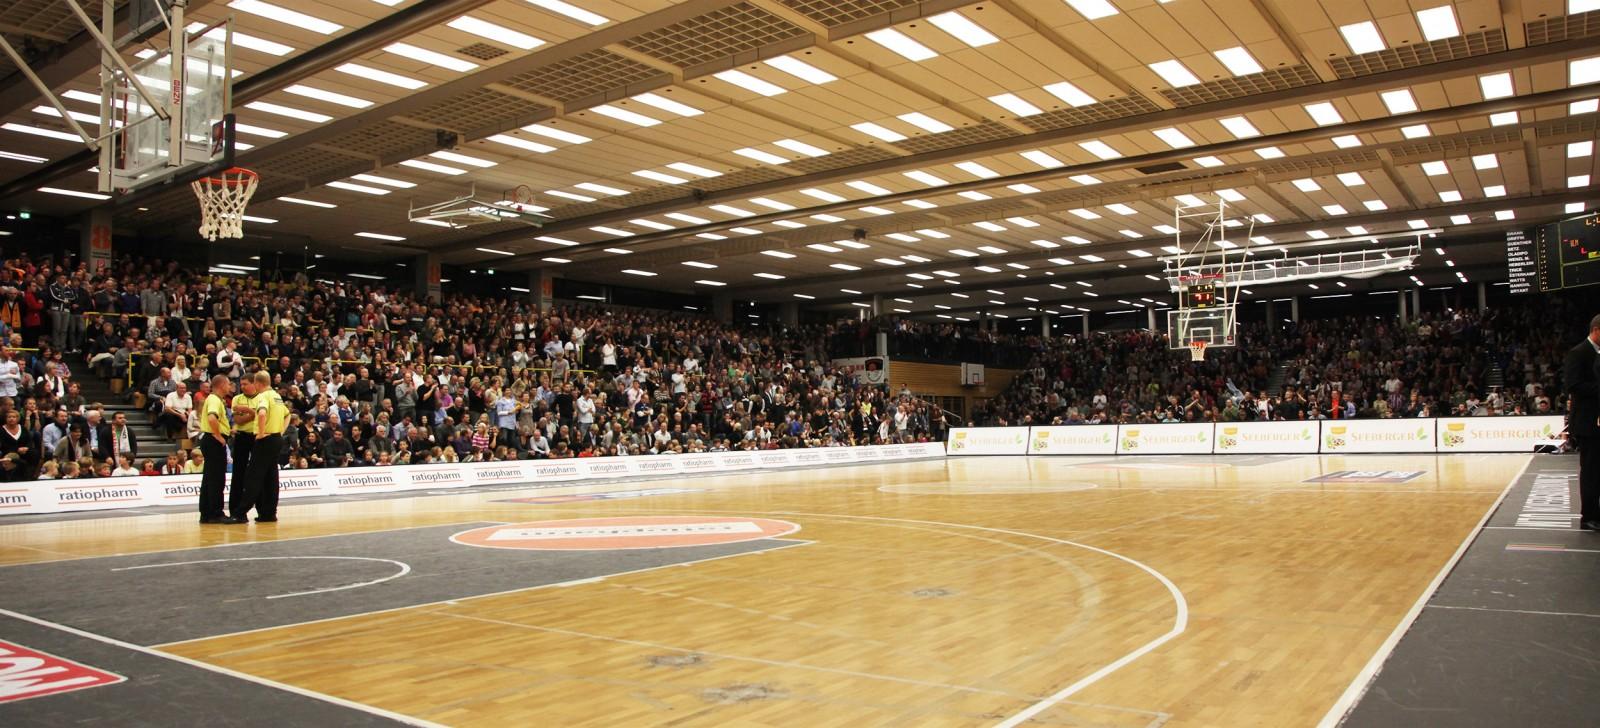 Kuhberghalle_2